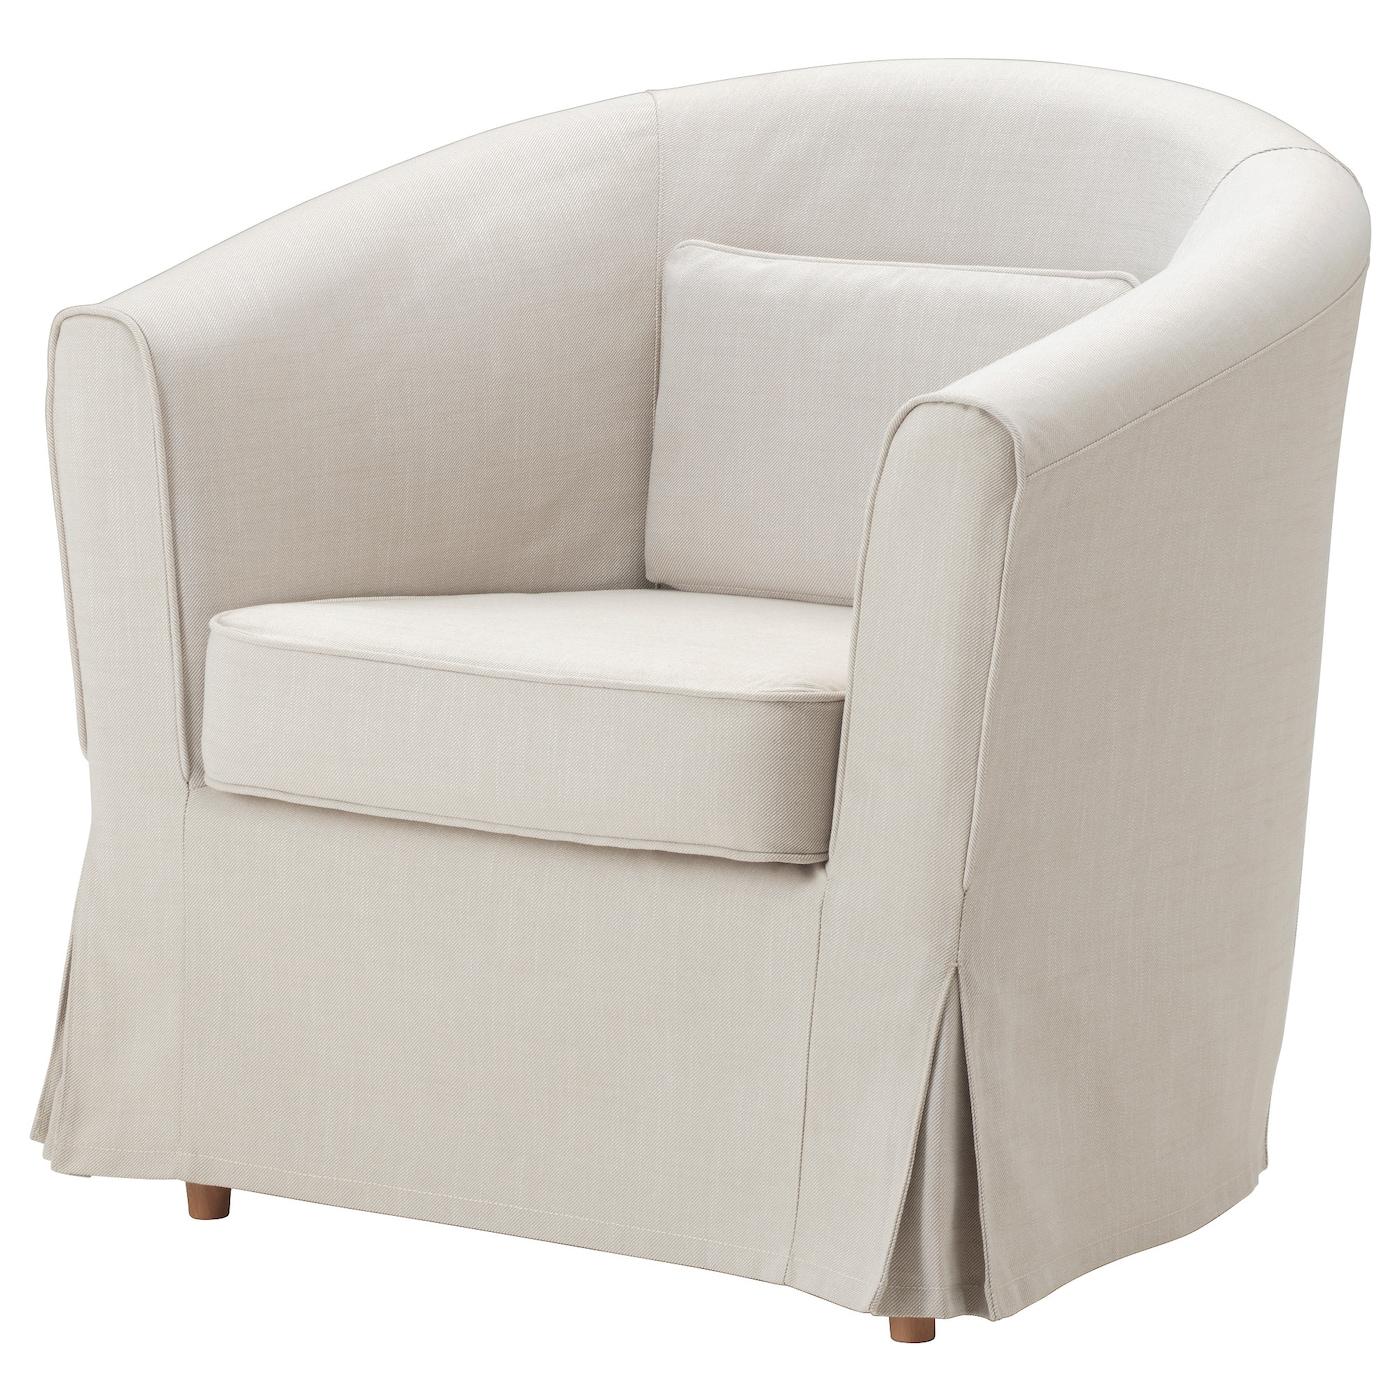 tullsta armchair cover nordvalla beige ikea. Black Bedroom Furniture Sets. Home Design Ideas